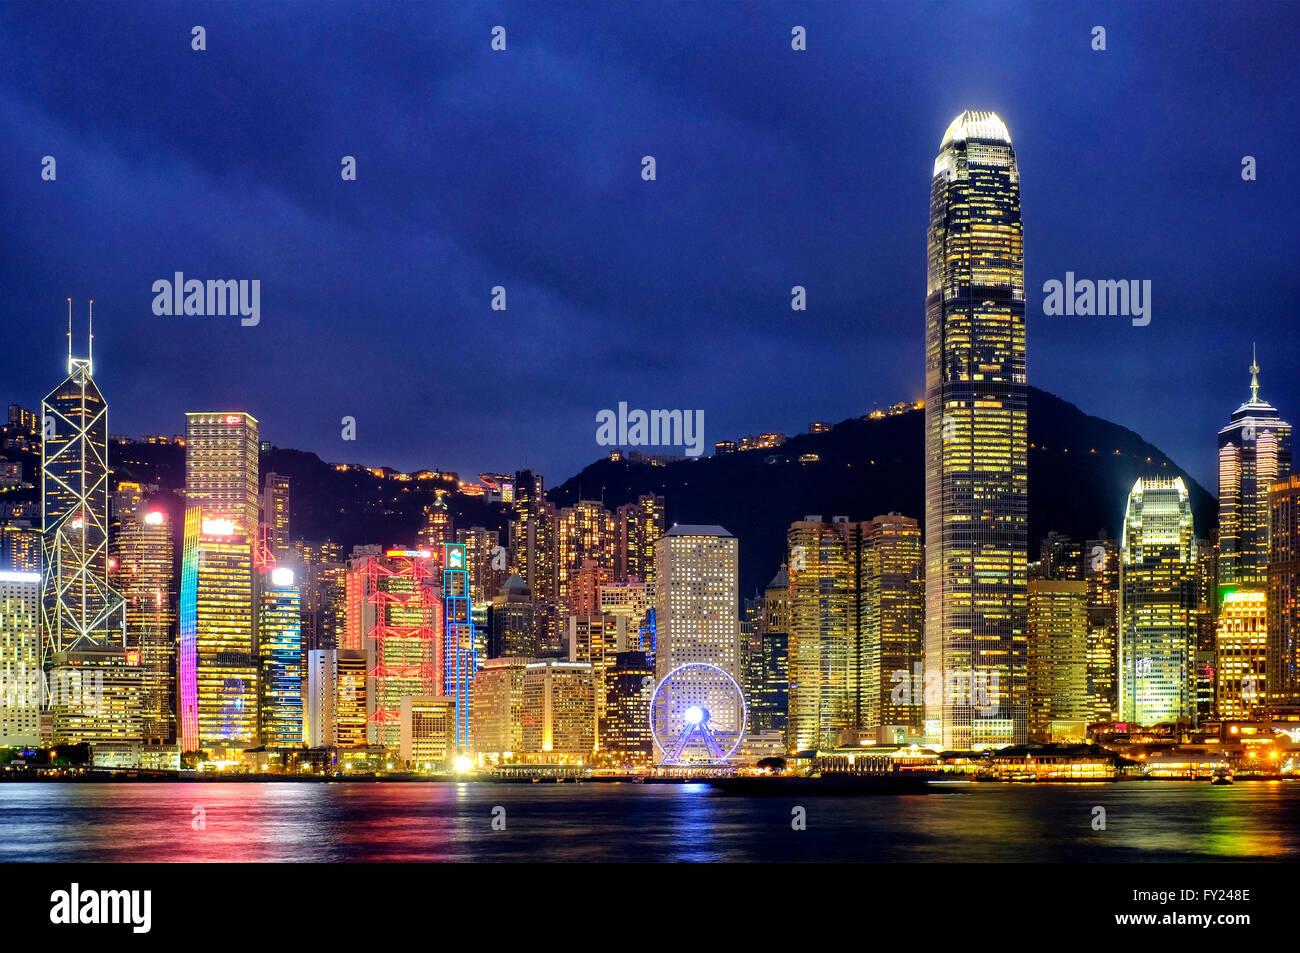 Hong Kong island skyline from Victoria Harbour, Hong Kong, China - Stock Image